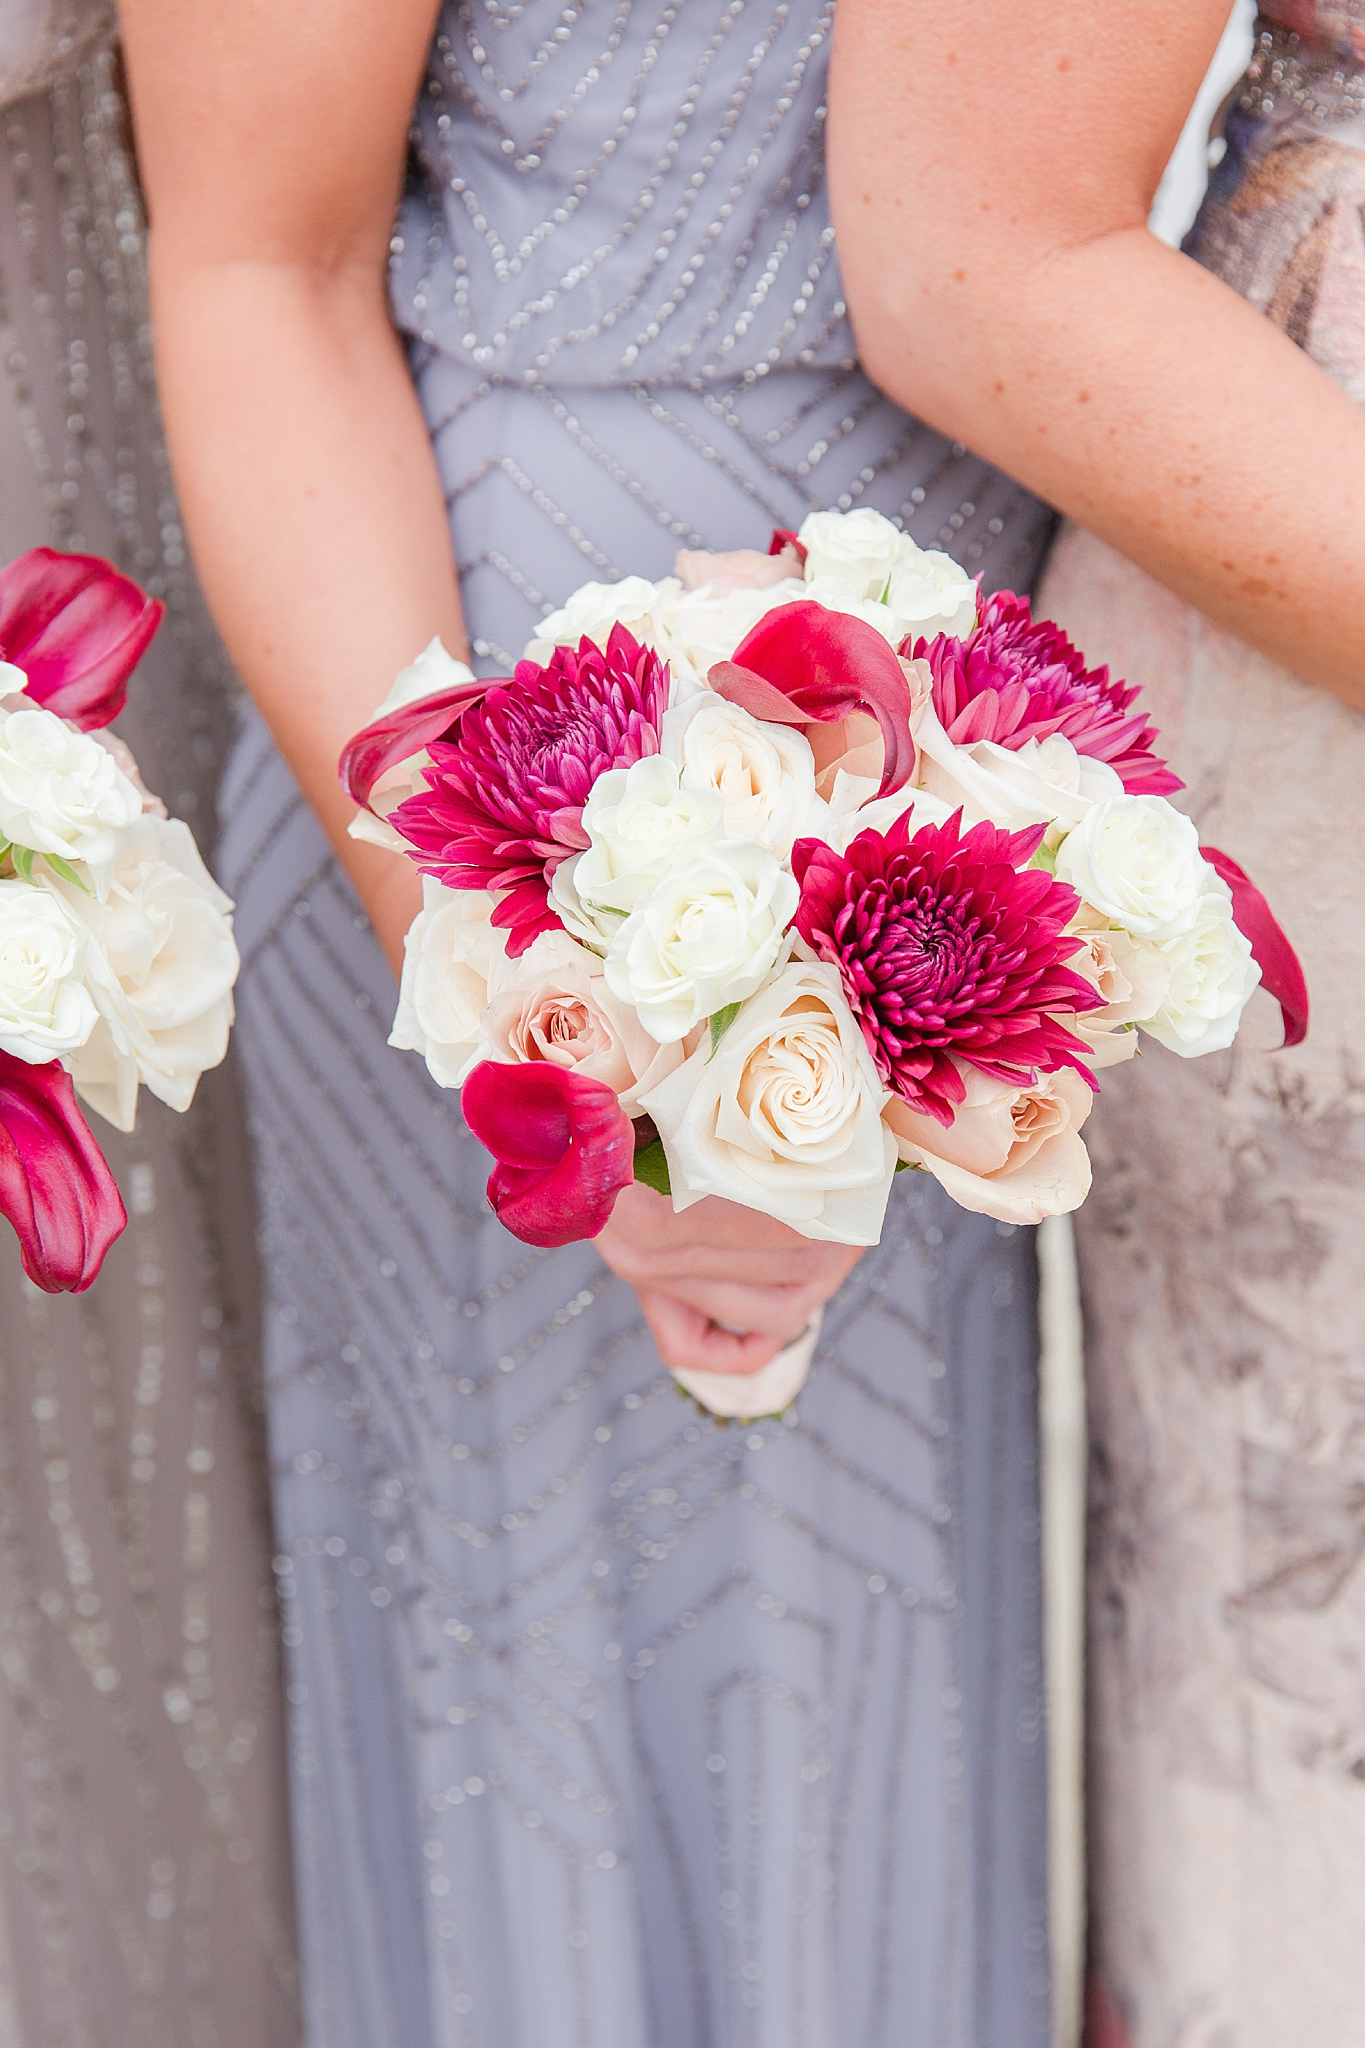 detroit-colony-club-wedding-regal-romantic-photography-in-detroit-mi-by-courtney-carolyn-photography_0016.jpg